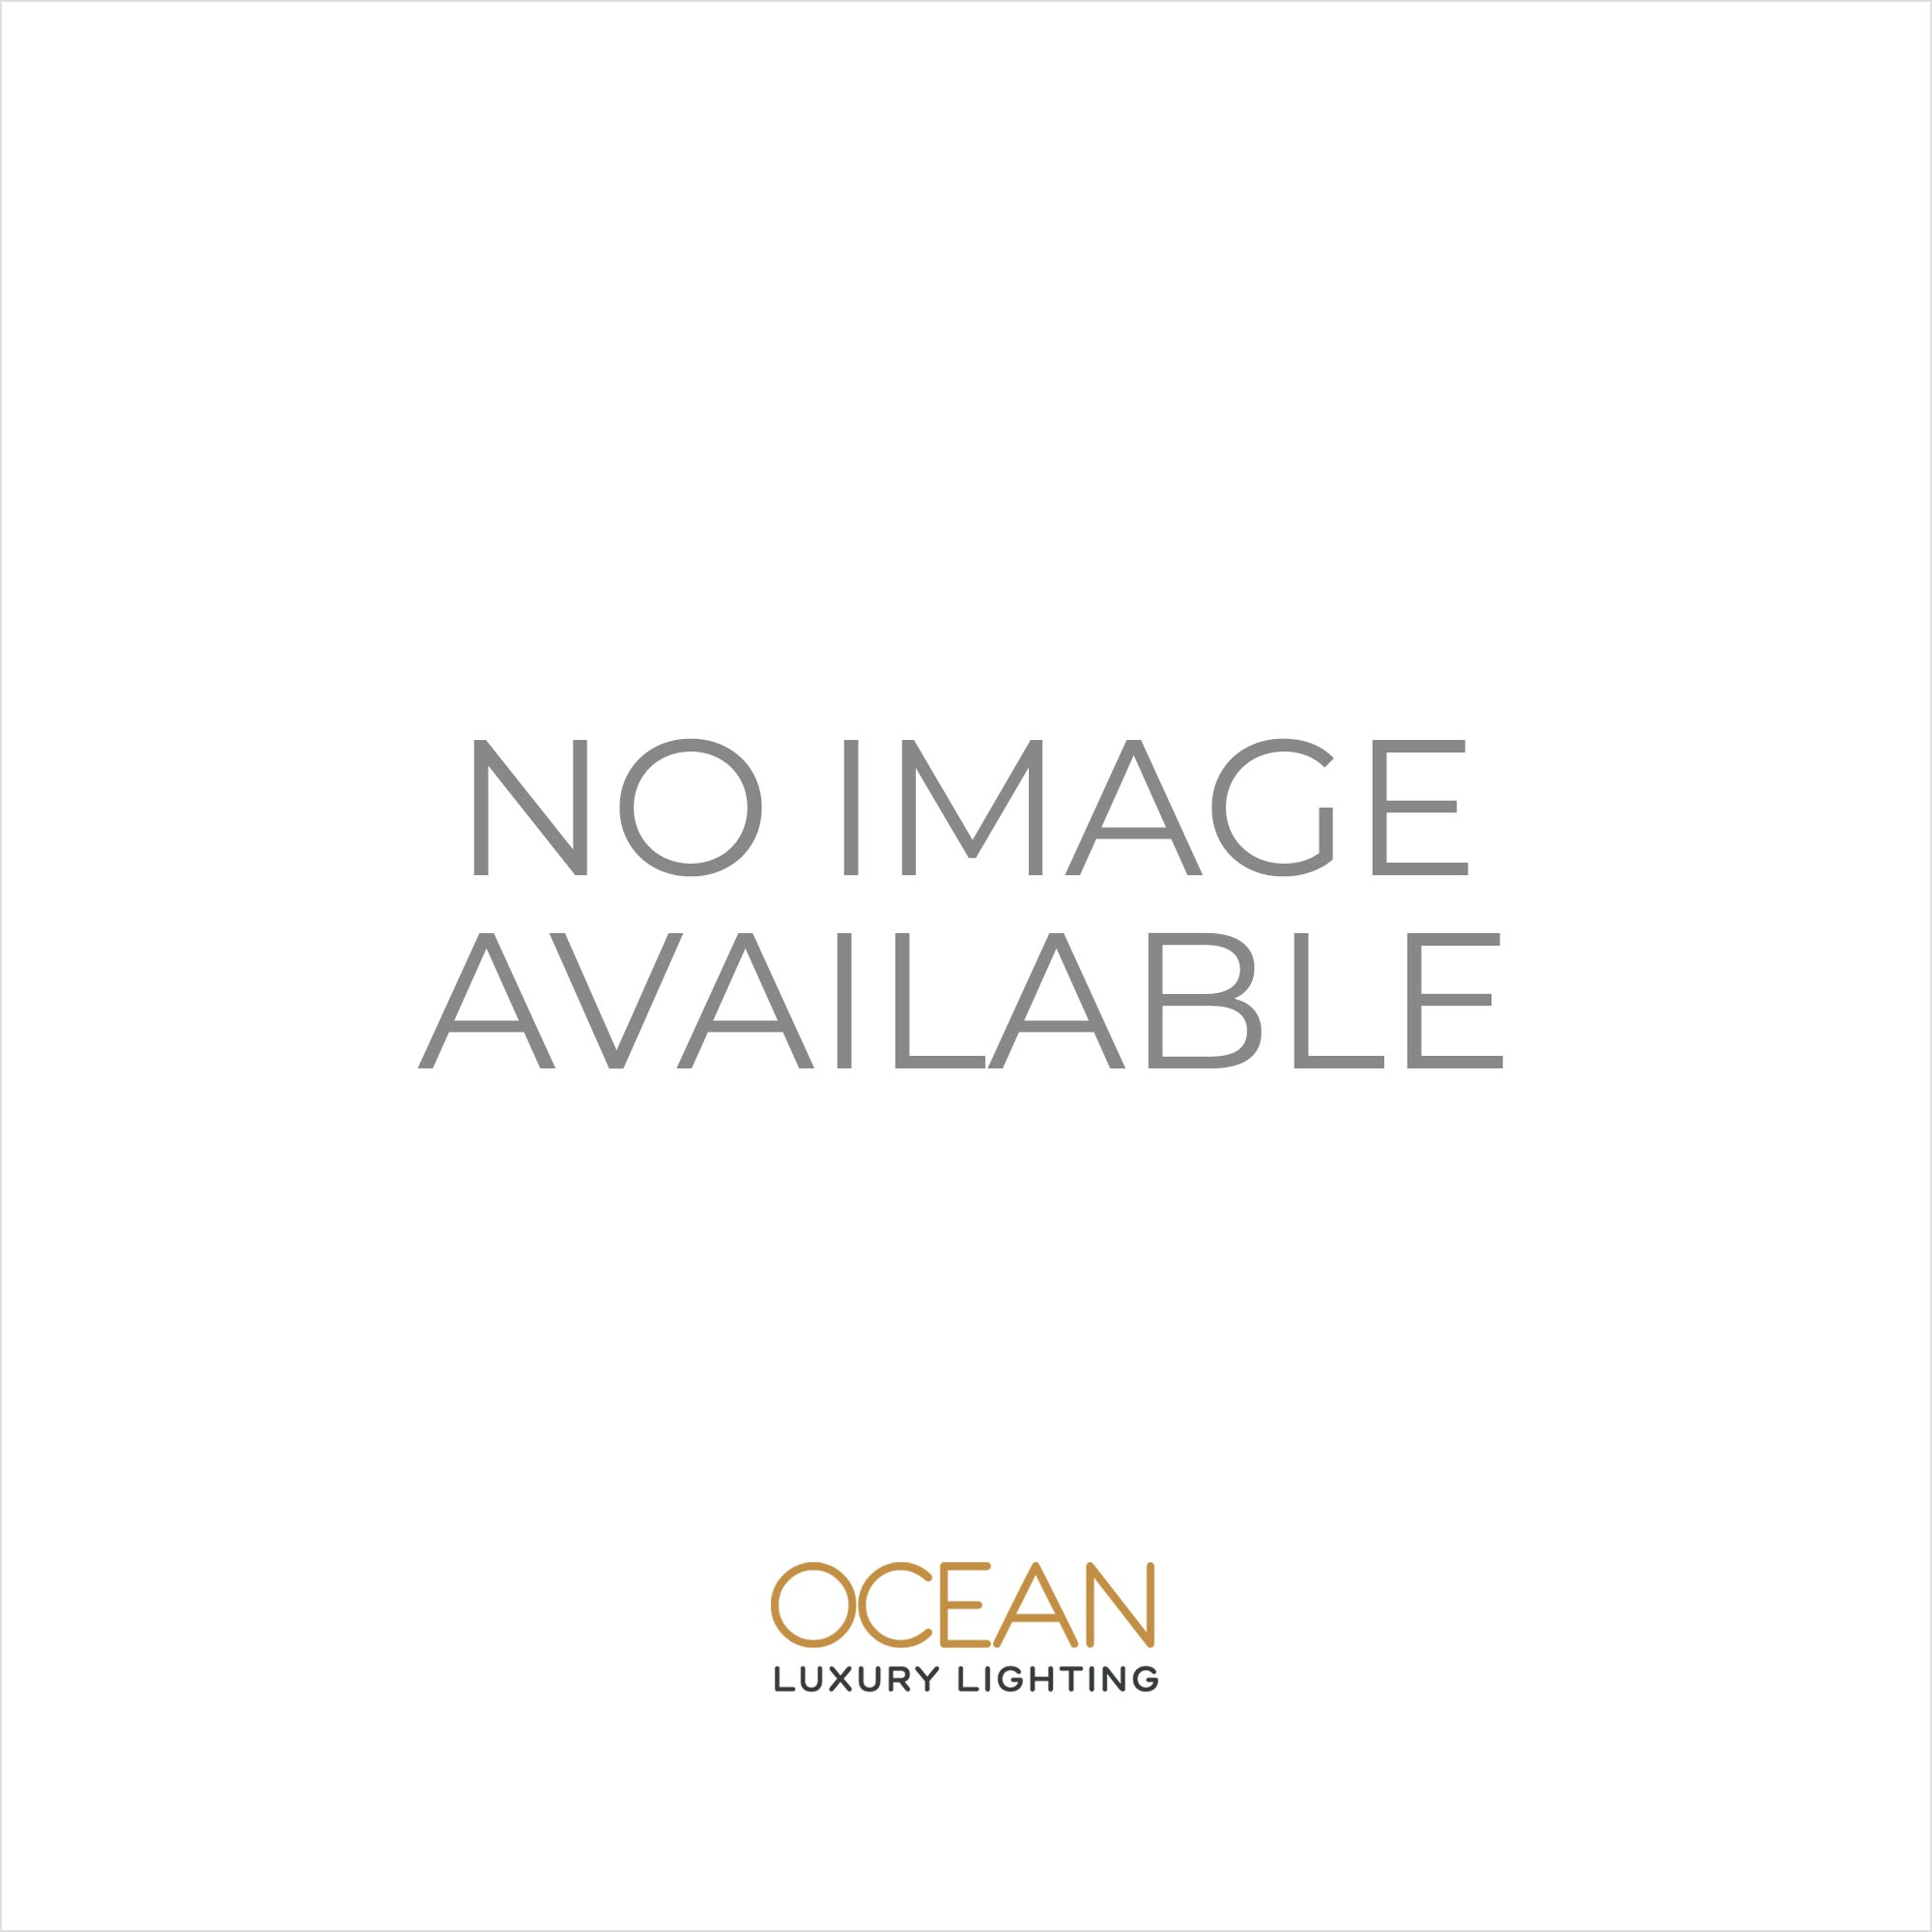 Bur0350 bureau 3 light modern ceiling light flush fitting polished chrome finish with opal glass shades